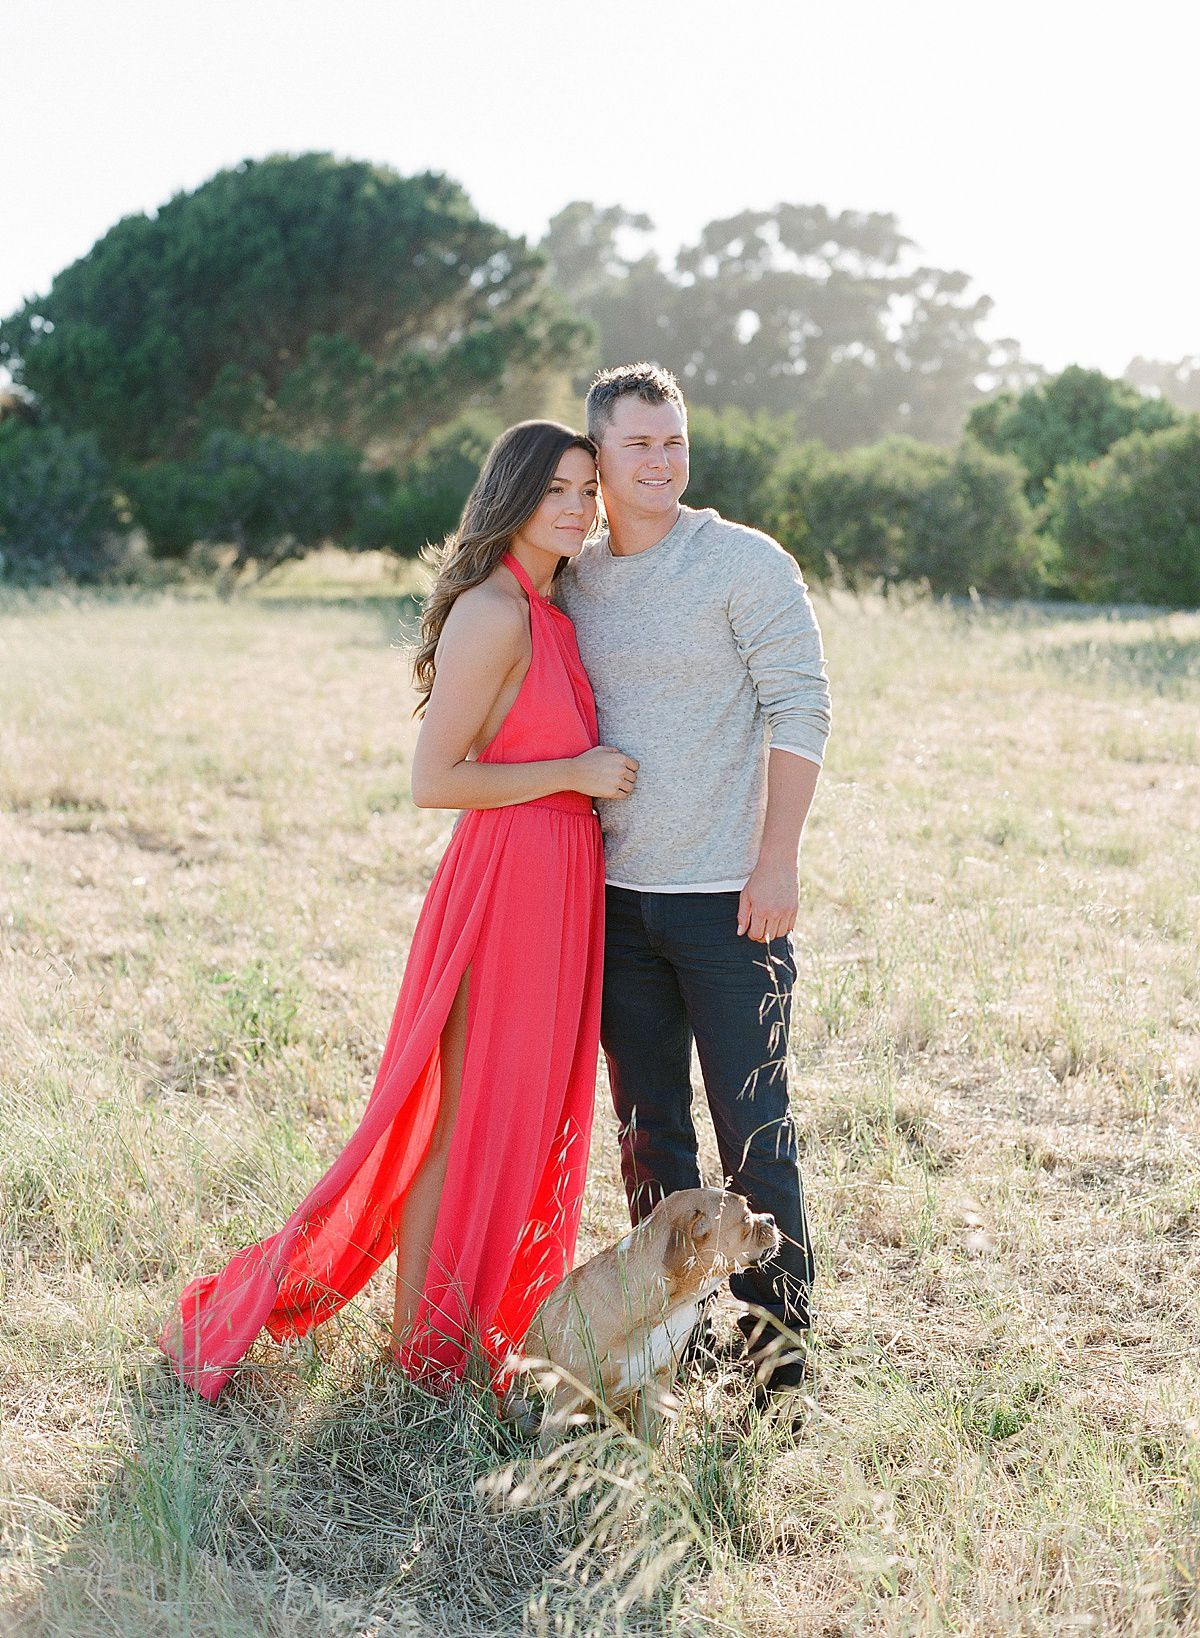 FREE 15+ Inspirational Modern Wedding Photography Ideas